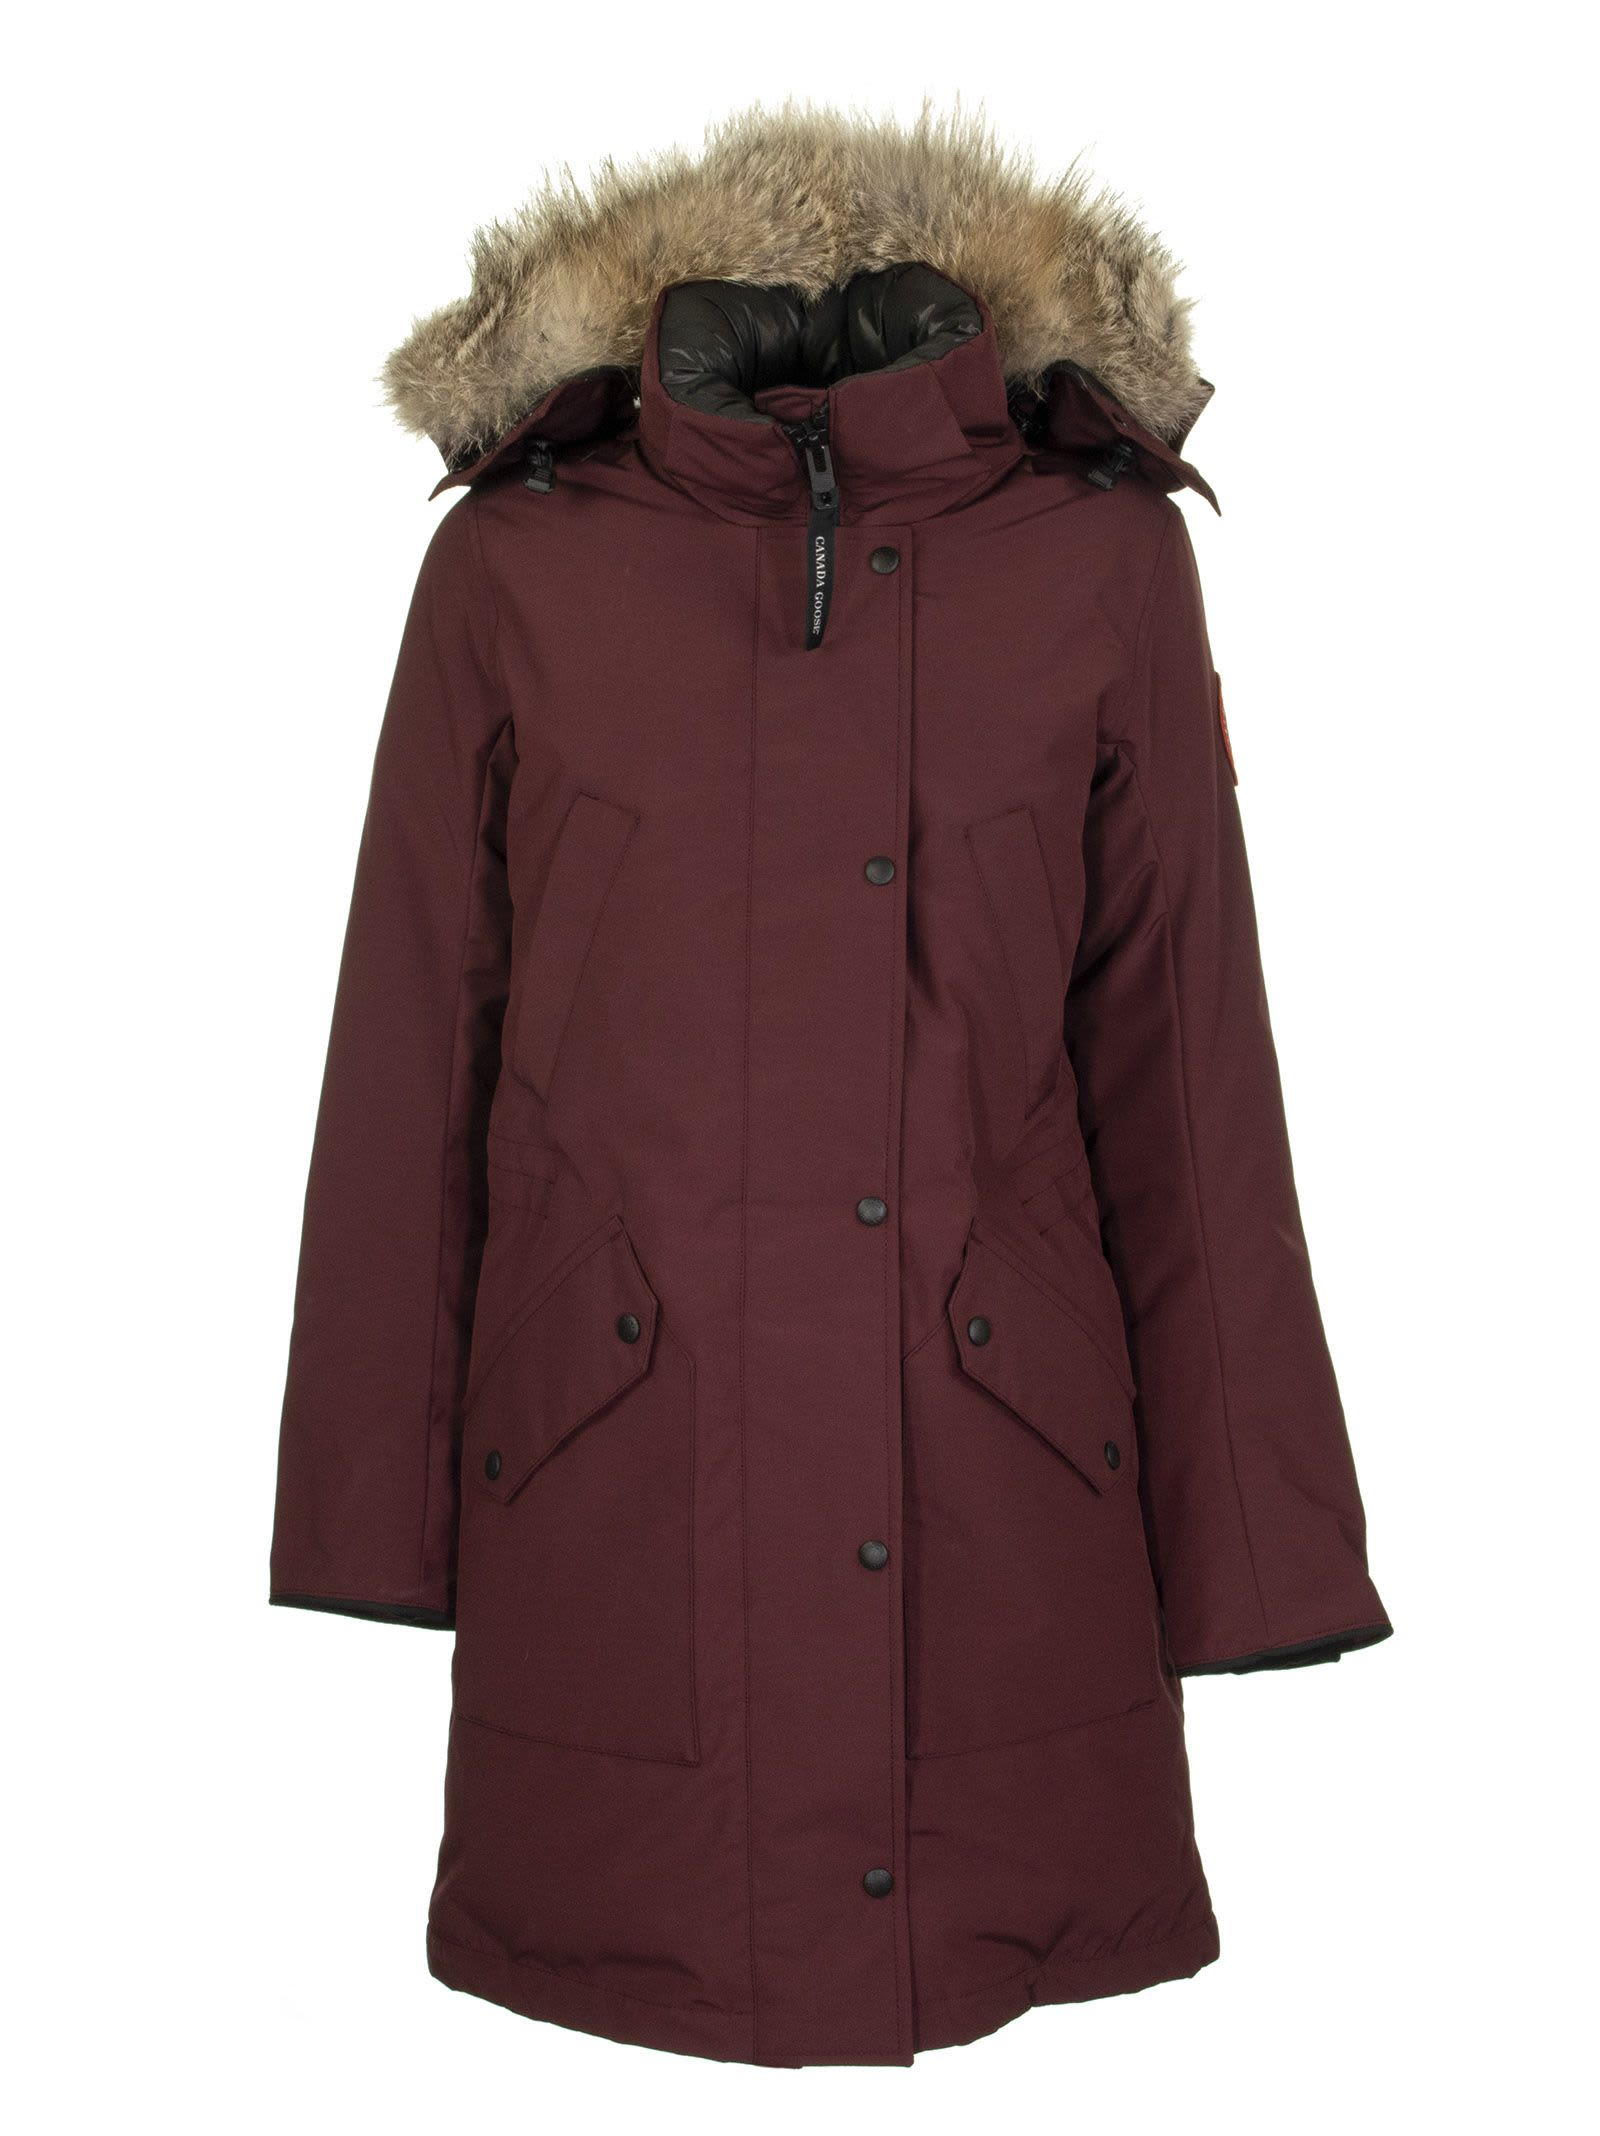 Photo of  Canada Goose Ellesmere Parka Elderber- shop Canada Goose jackets online sales